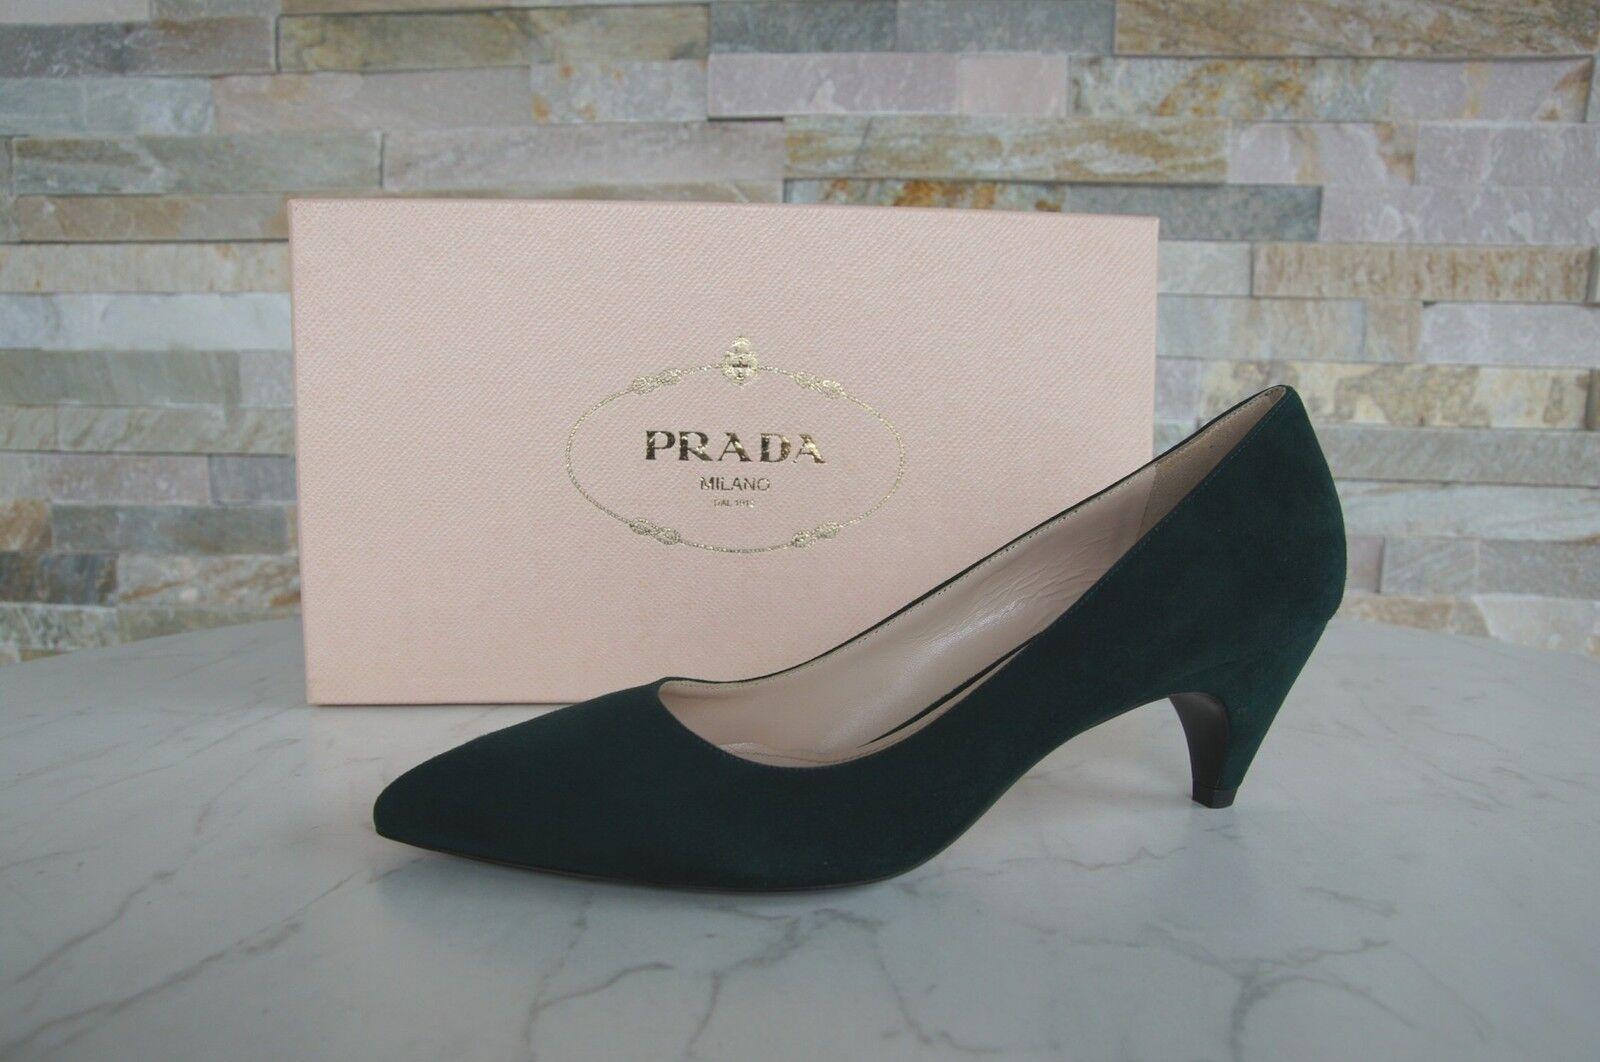 Prada Prada Prada talla 39 zapatos de salón zapatos zapatos 1i064f botellas verde Bottiglia nuevo ex. PVP  servicio considerado